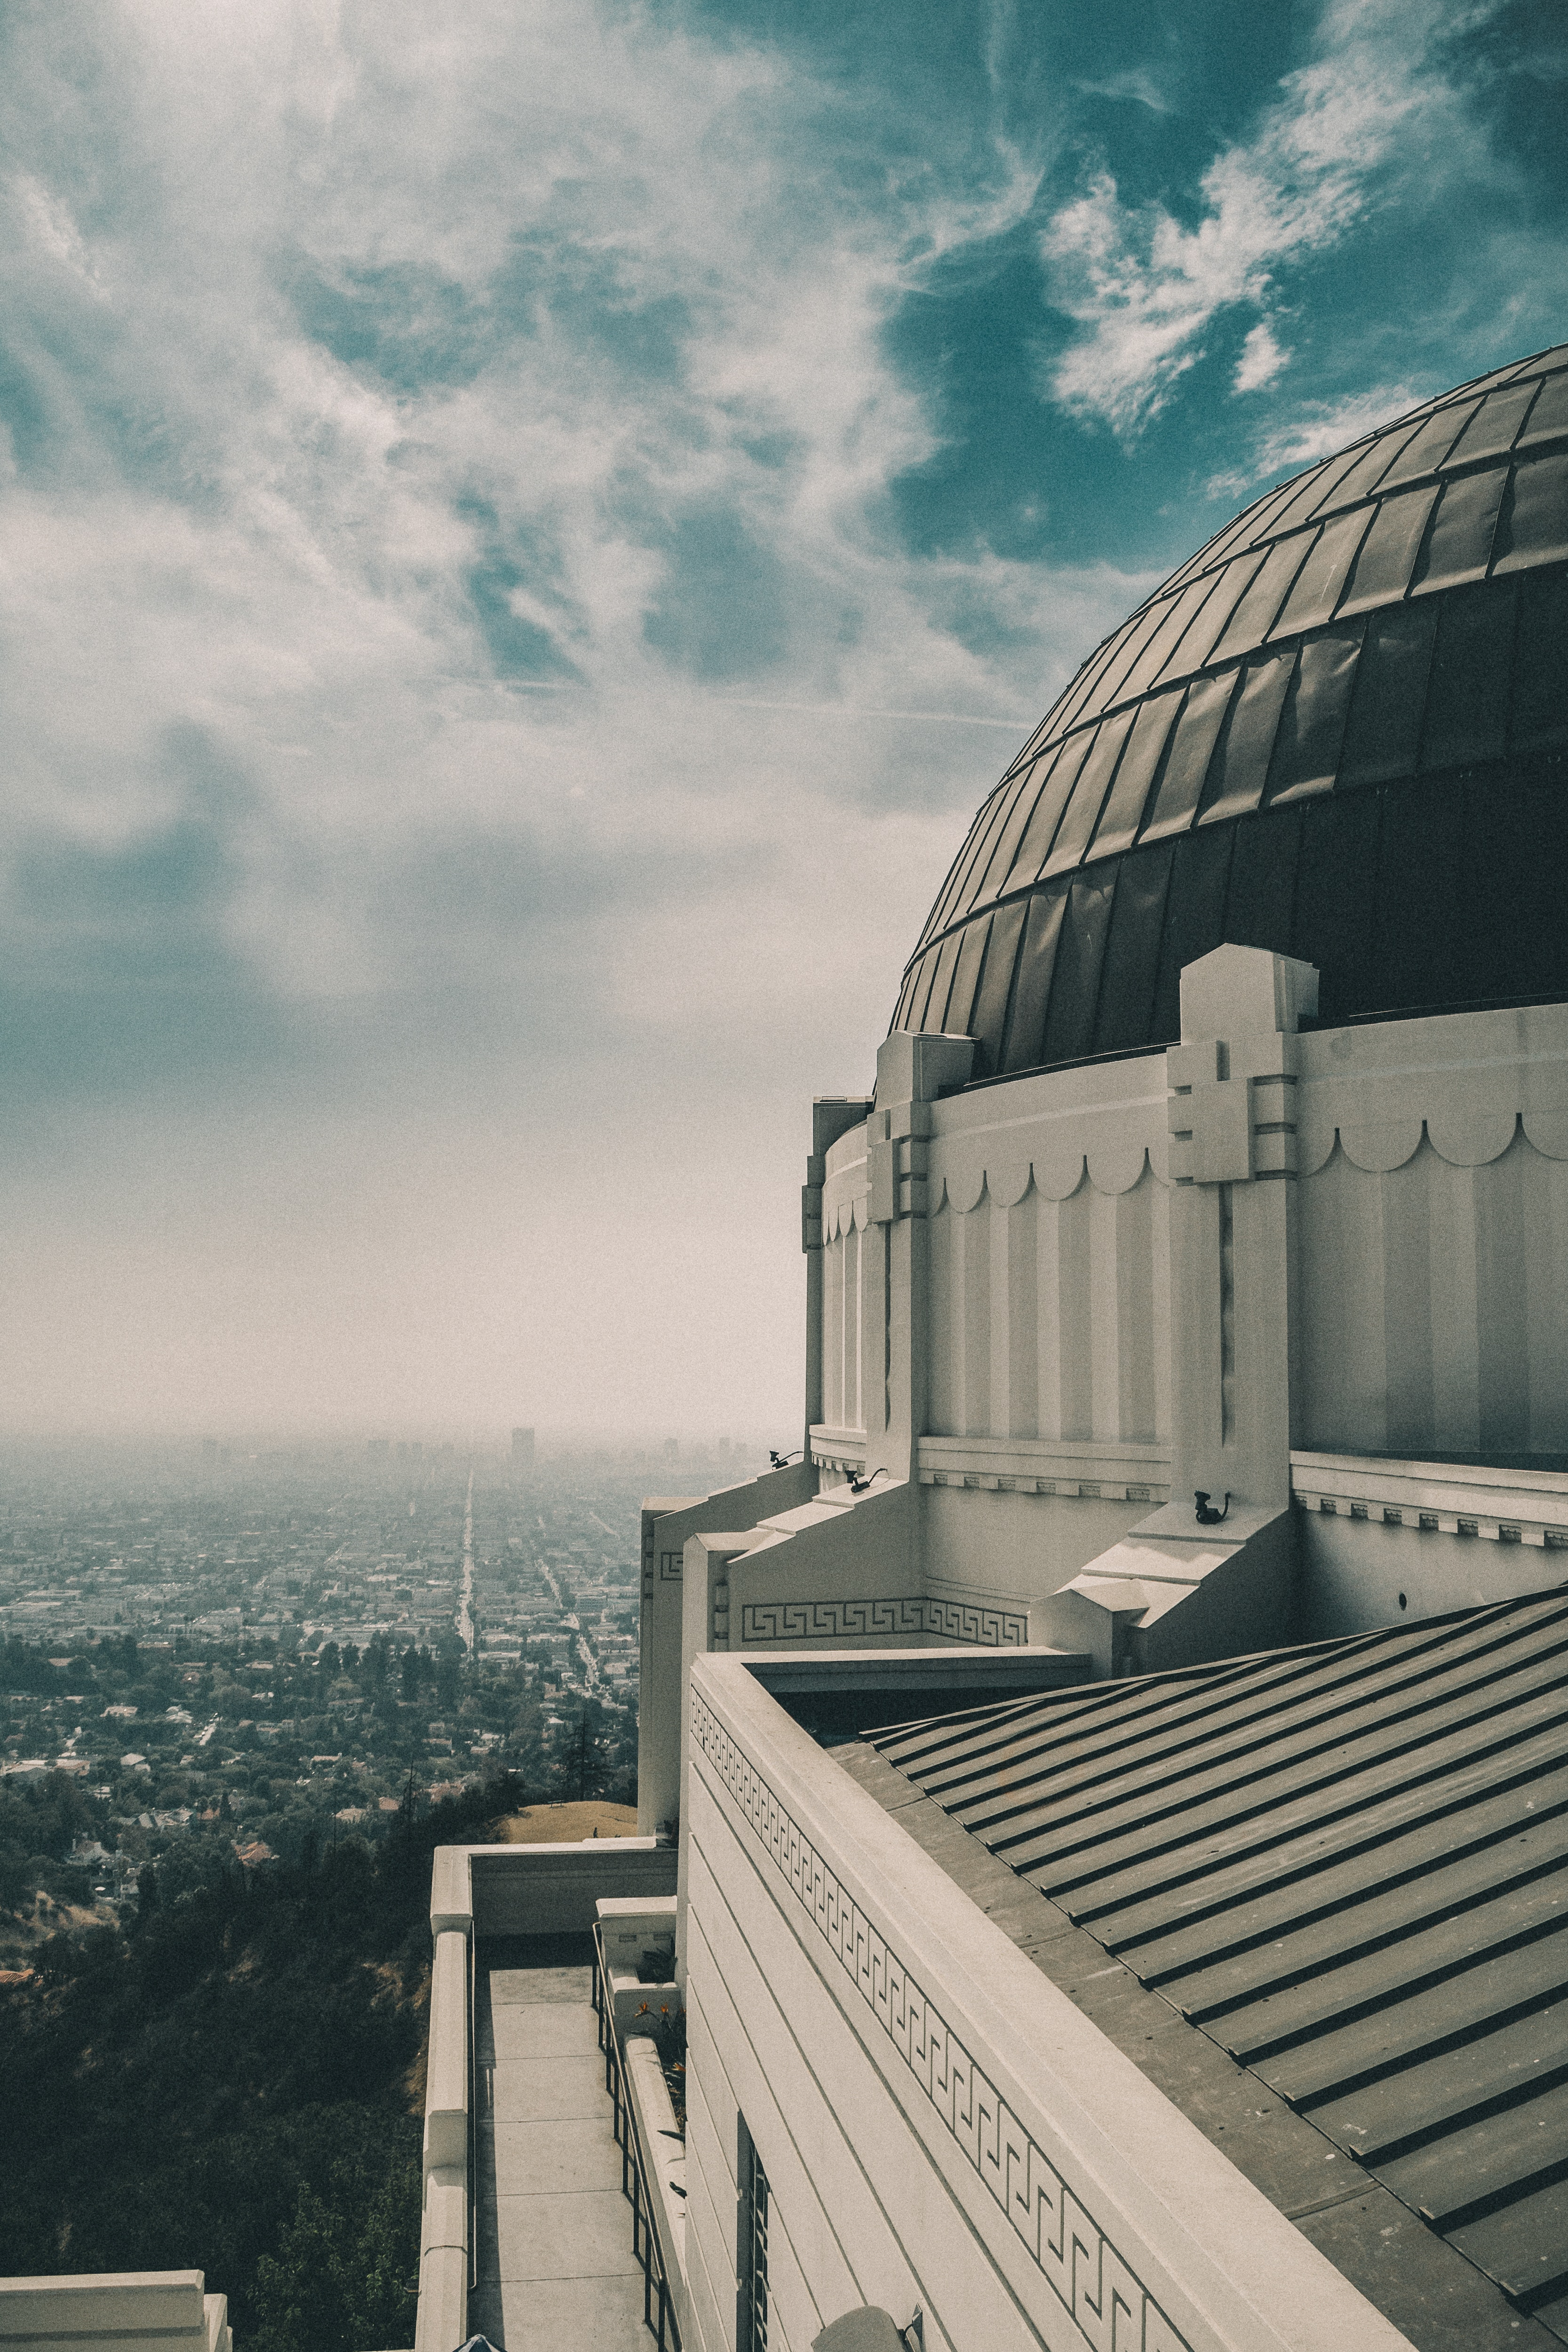 A white dome building